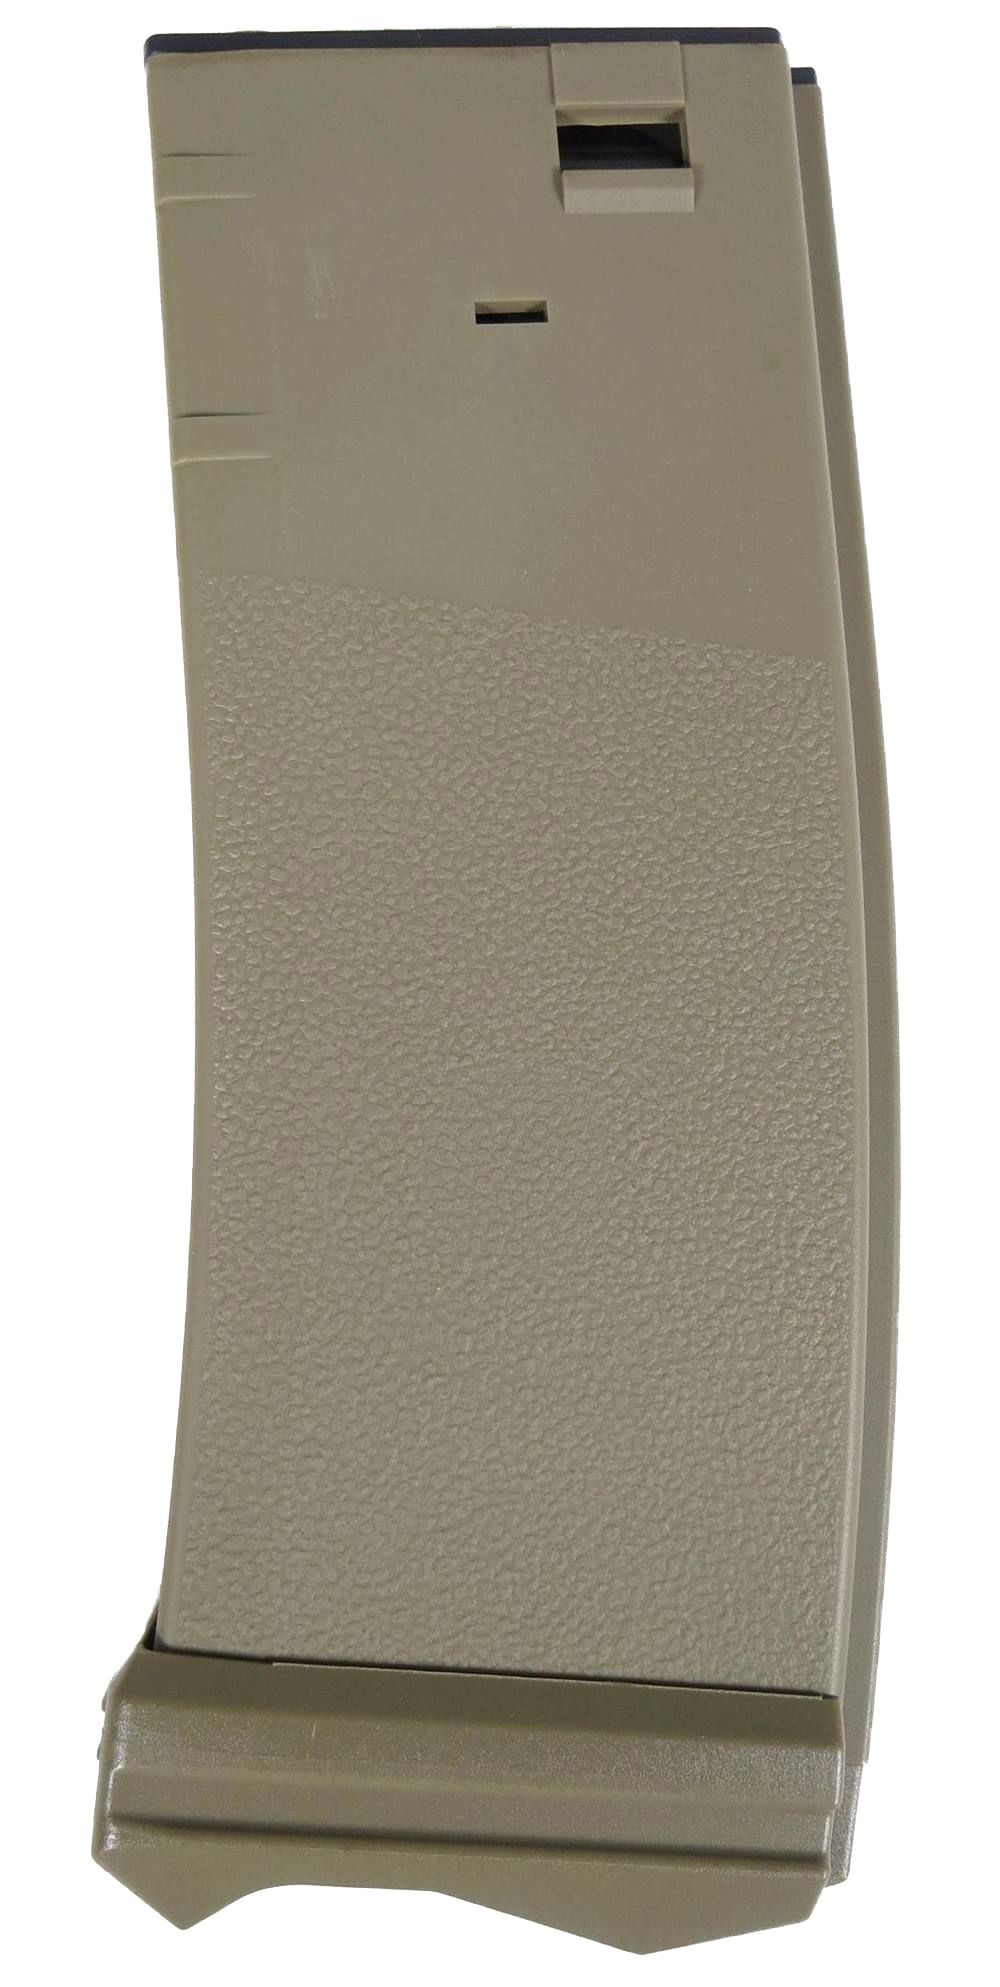 Magazine Modify Mid-cap 180 BBs - Cor: TAN